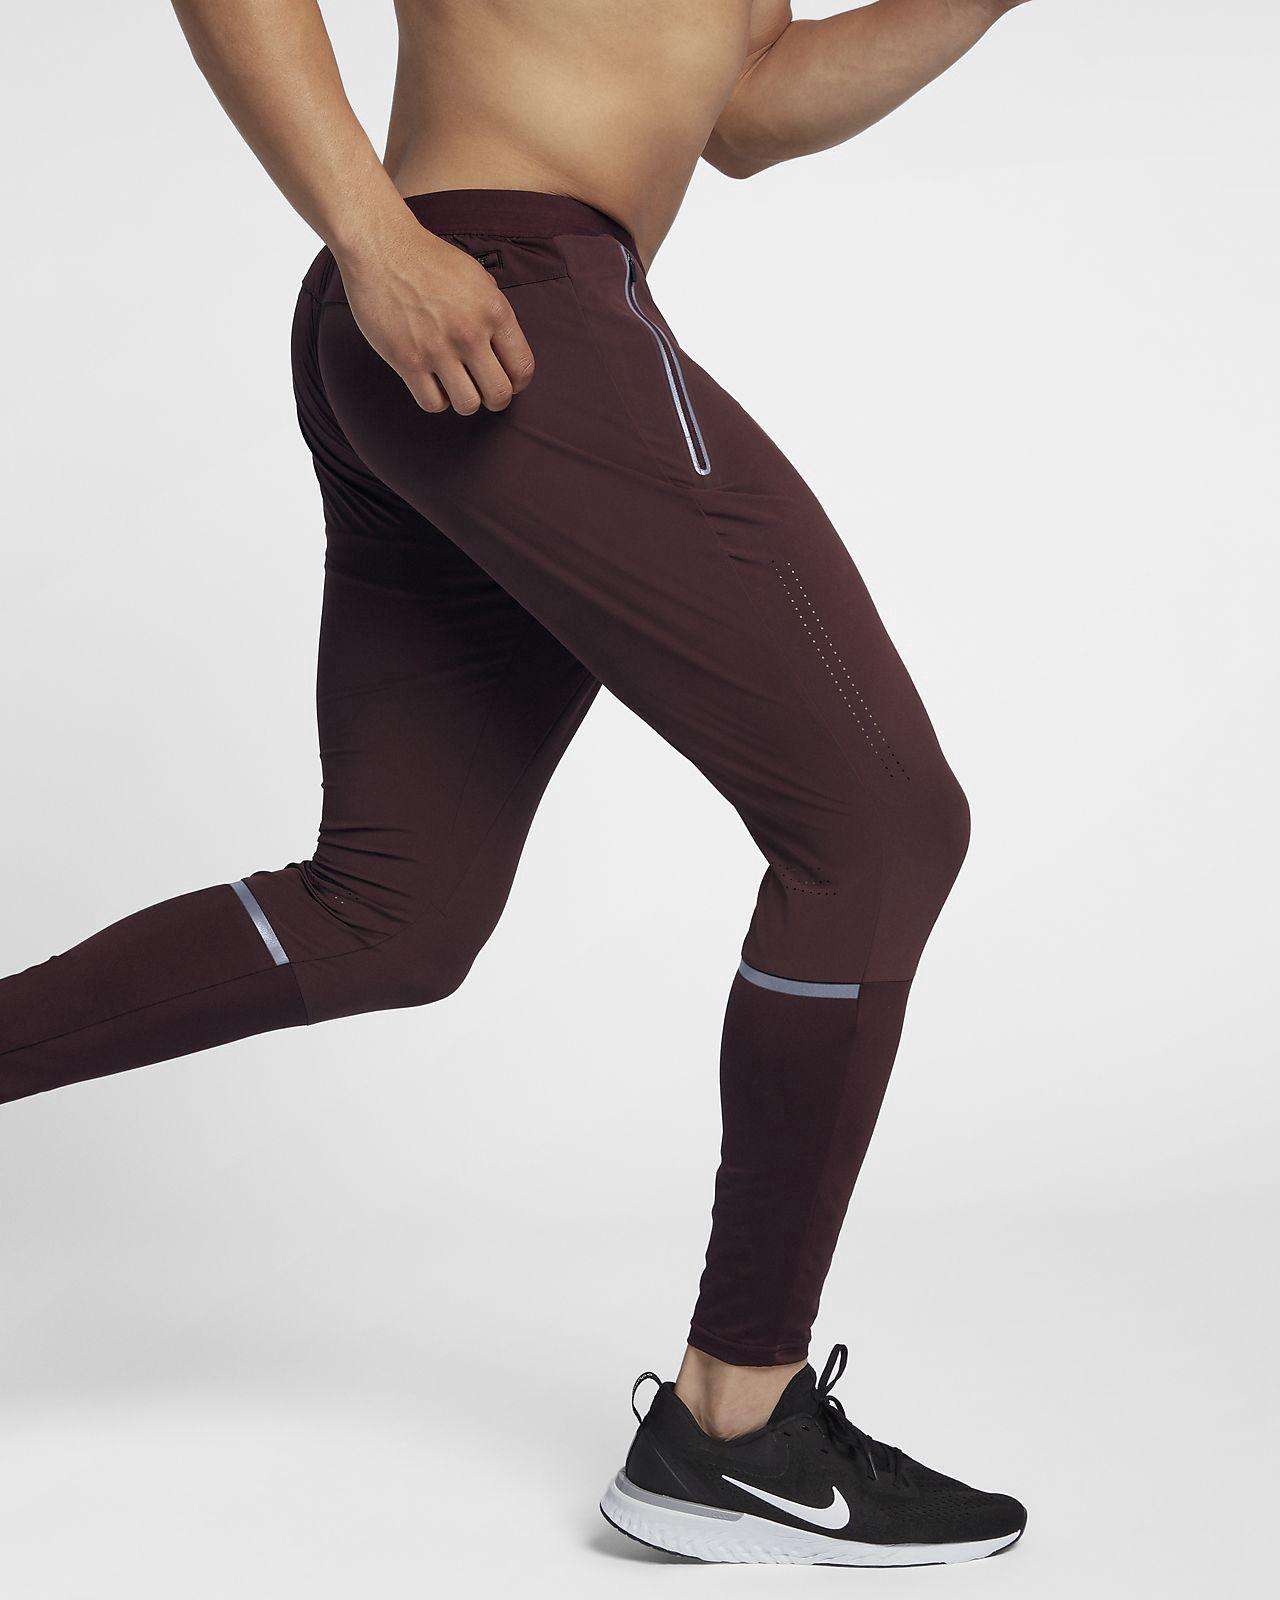 6950f4551b0b41 Nike Swift Men s Running Pants - 2XL Burgundy